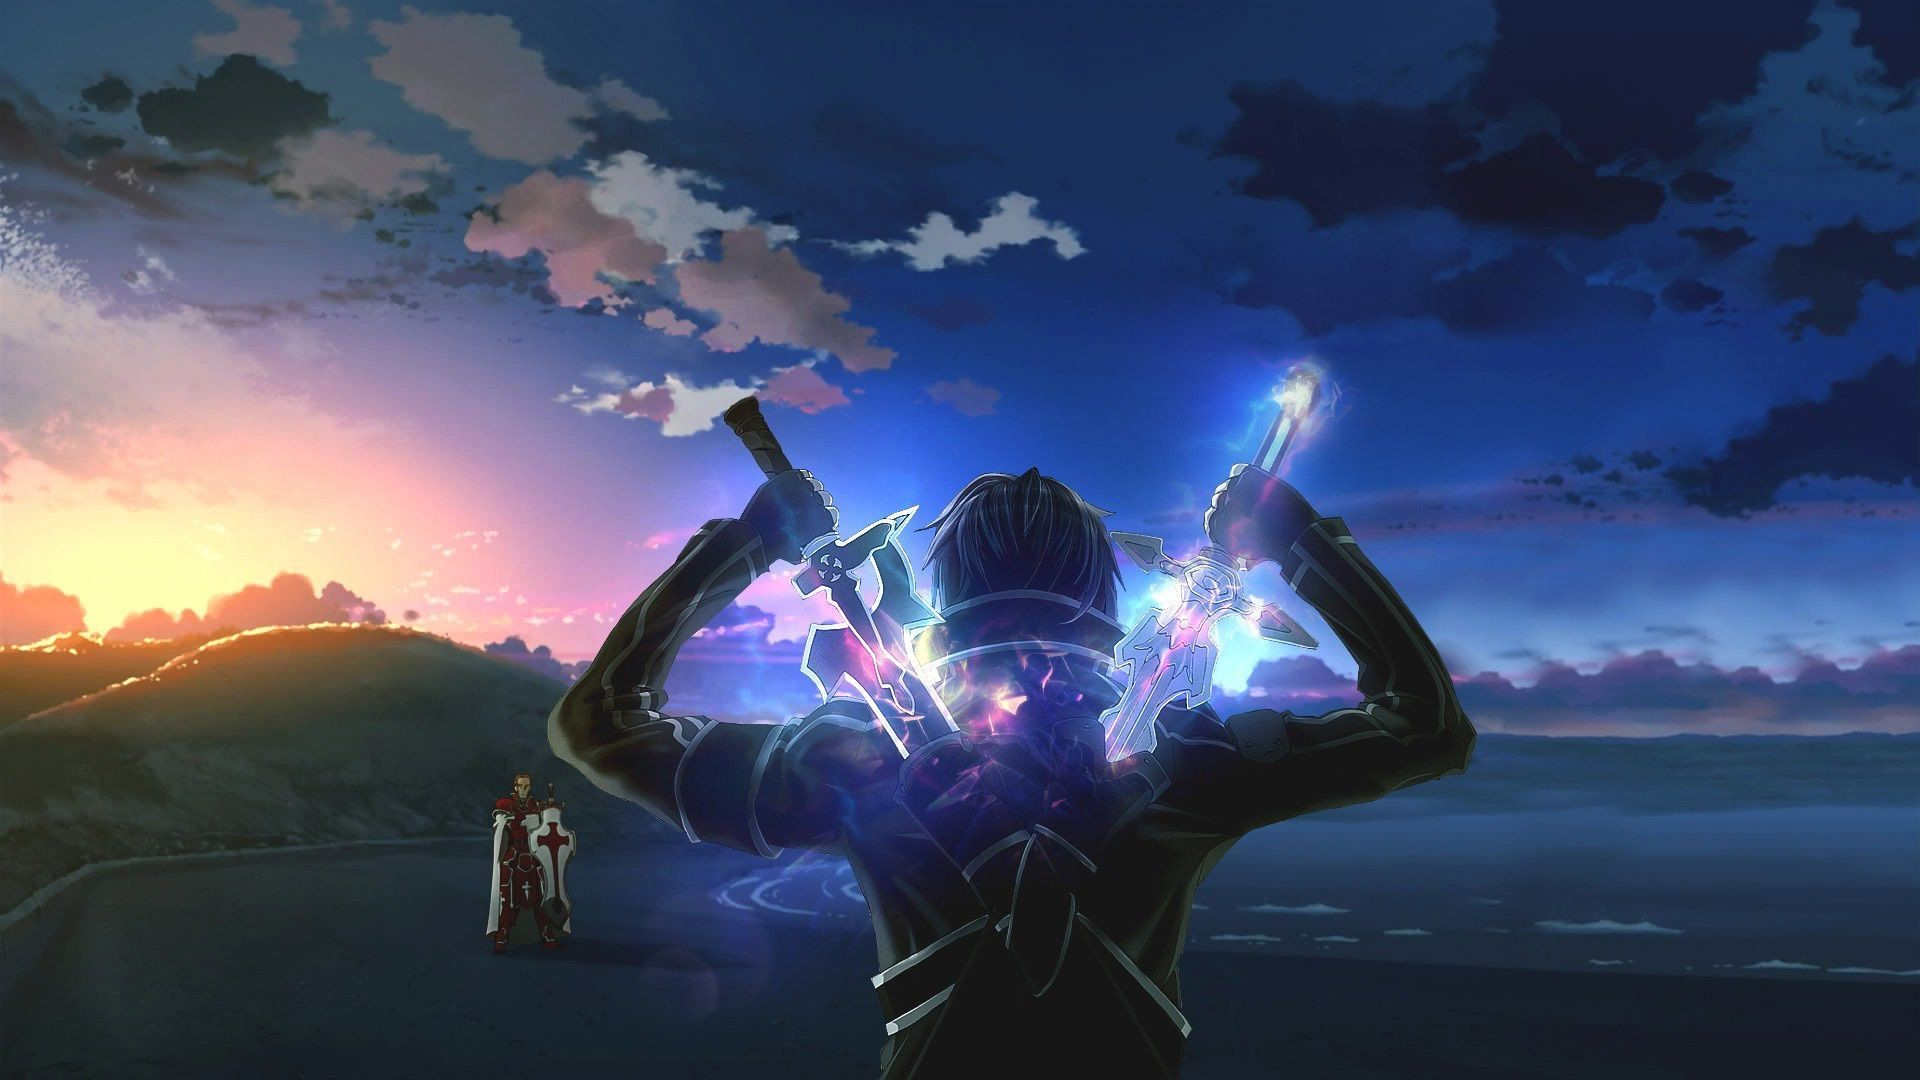 -sword-art-online-anime-hd-wallpaper-